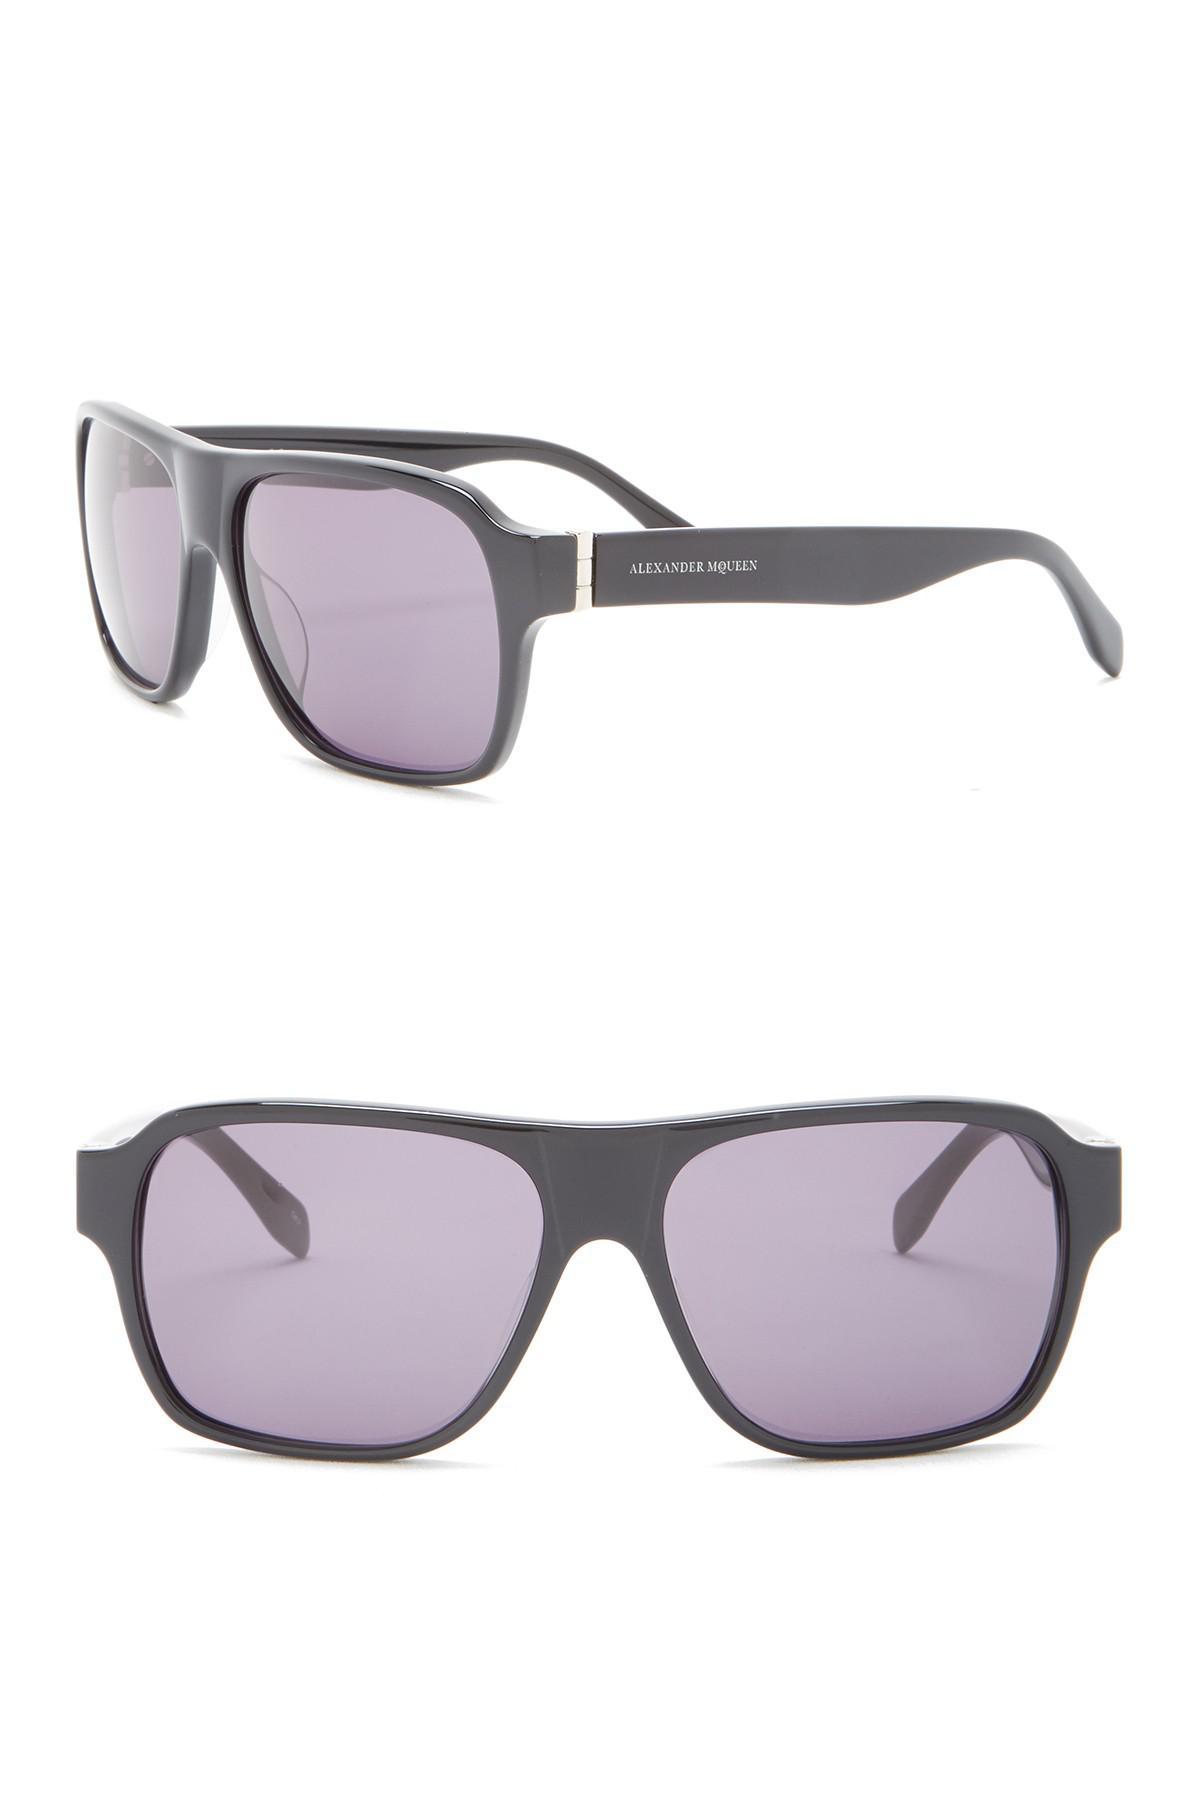 2e92116f97d Lyst - Alexander Mcqueen 57mm Rectangle Sunglasses for Men